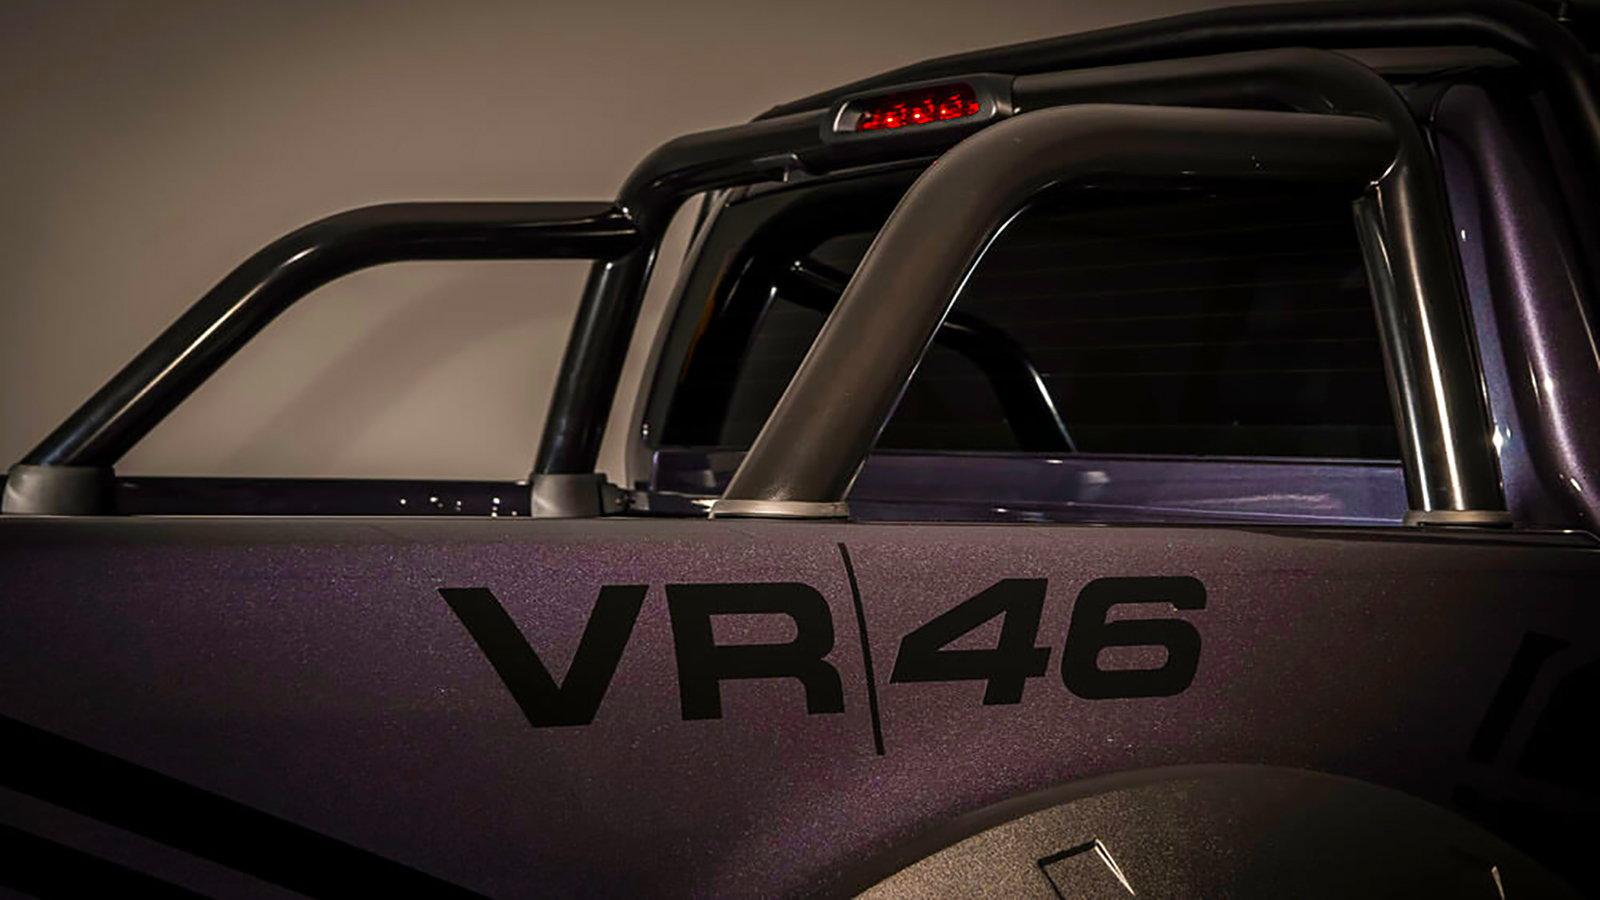 VR46, Ranger, Valentino Rossi